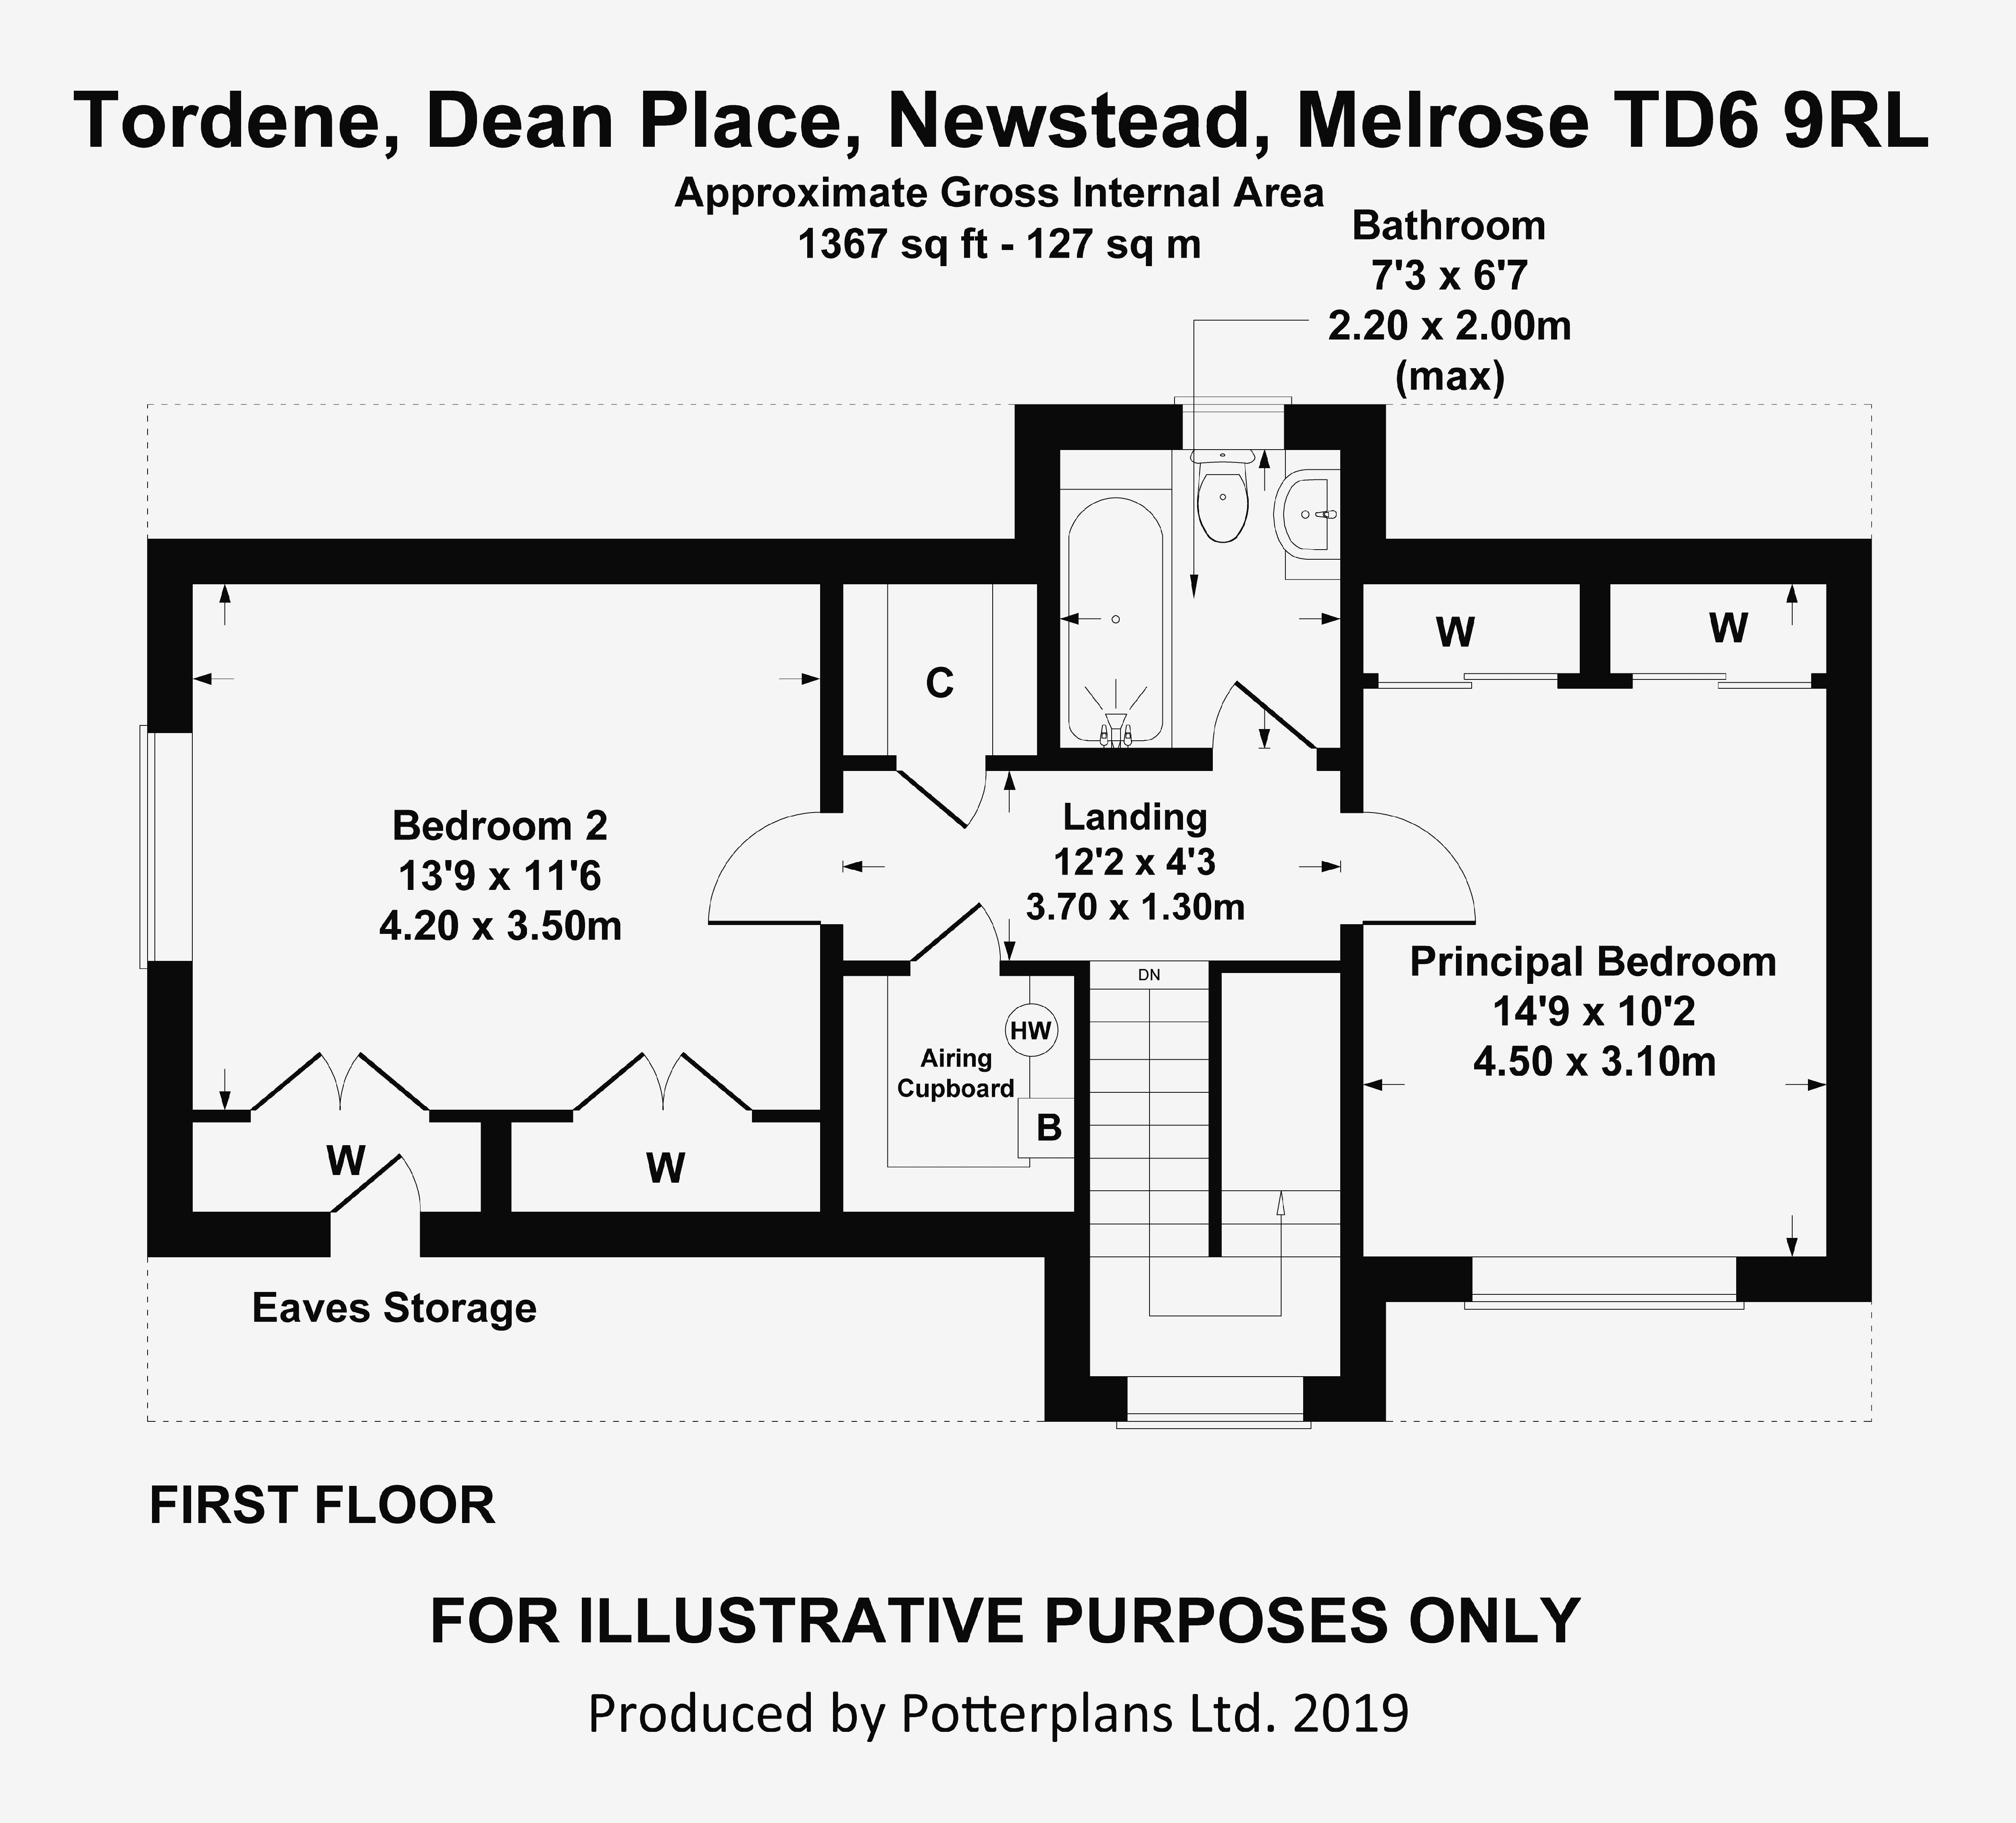 Tordene First Floor